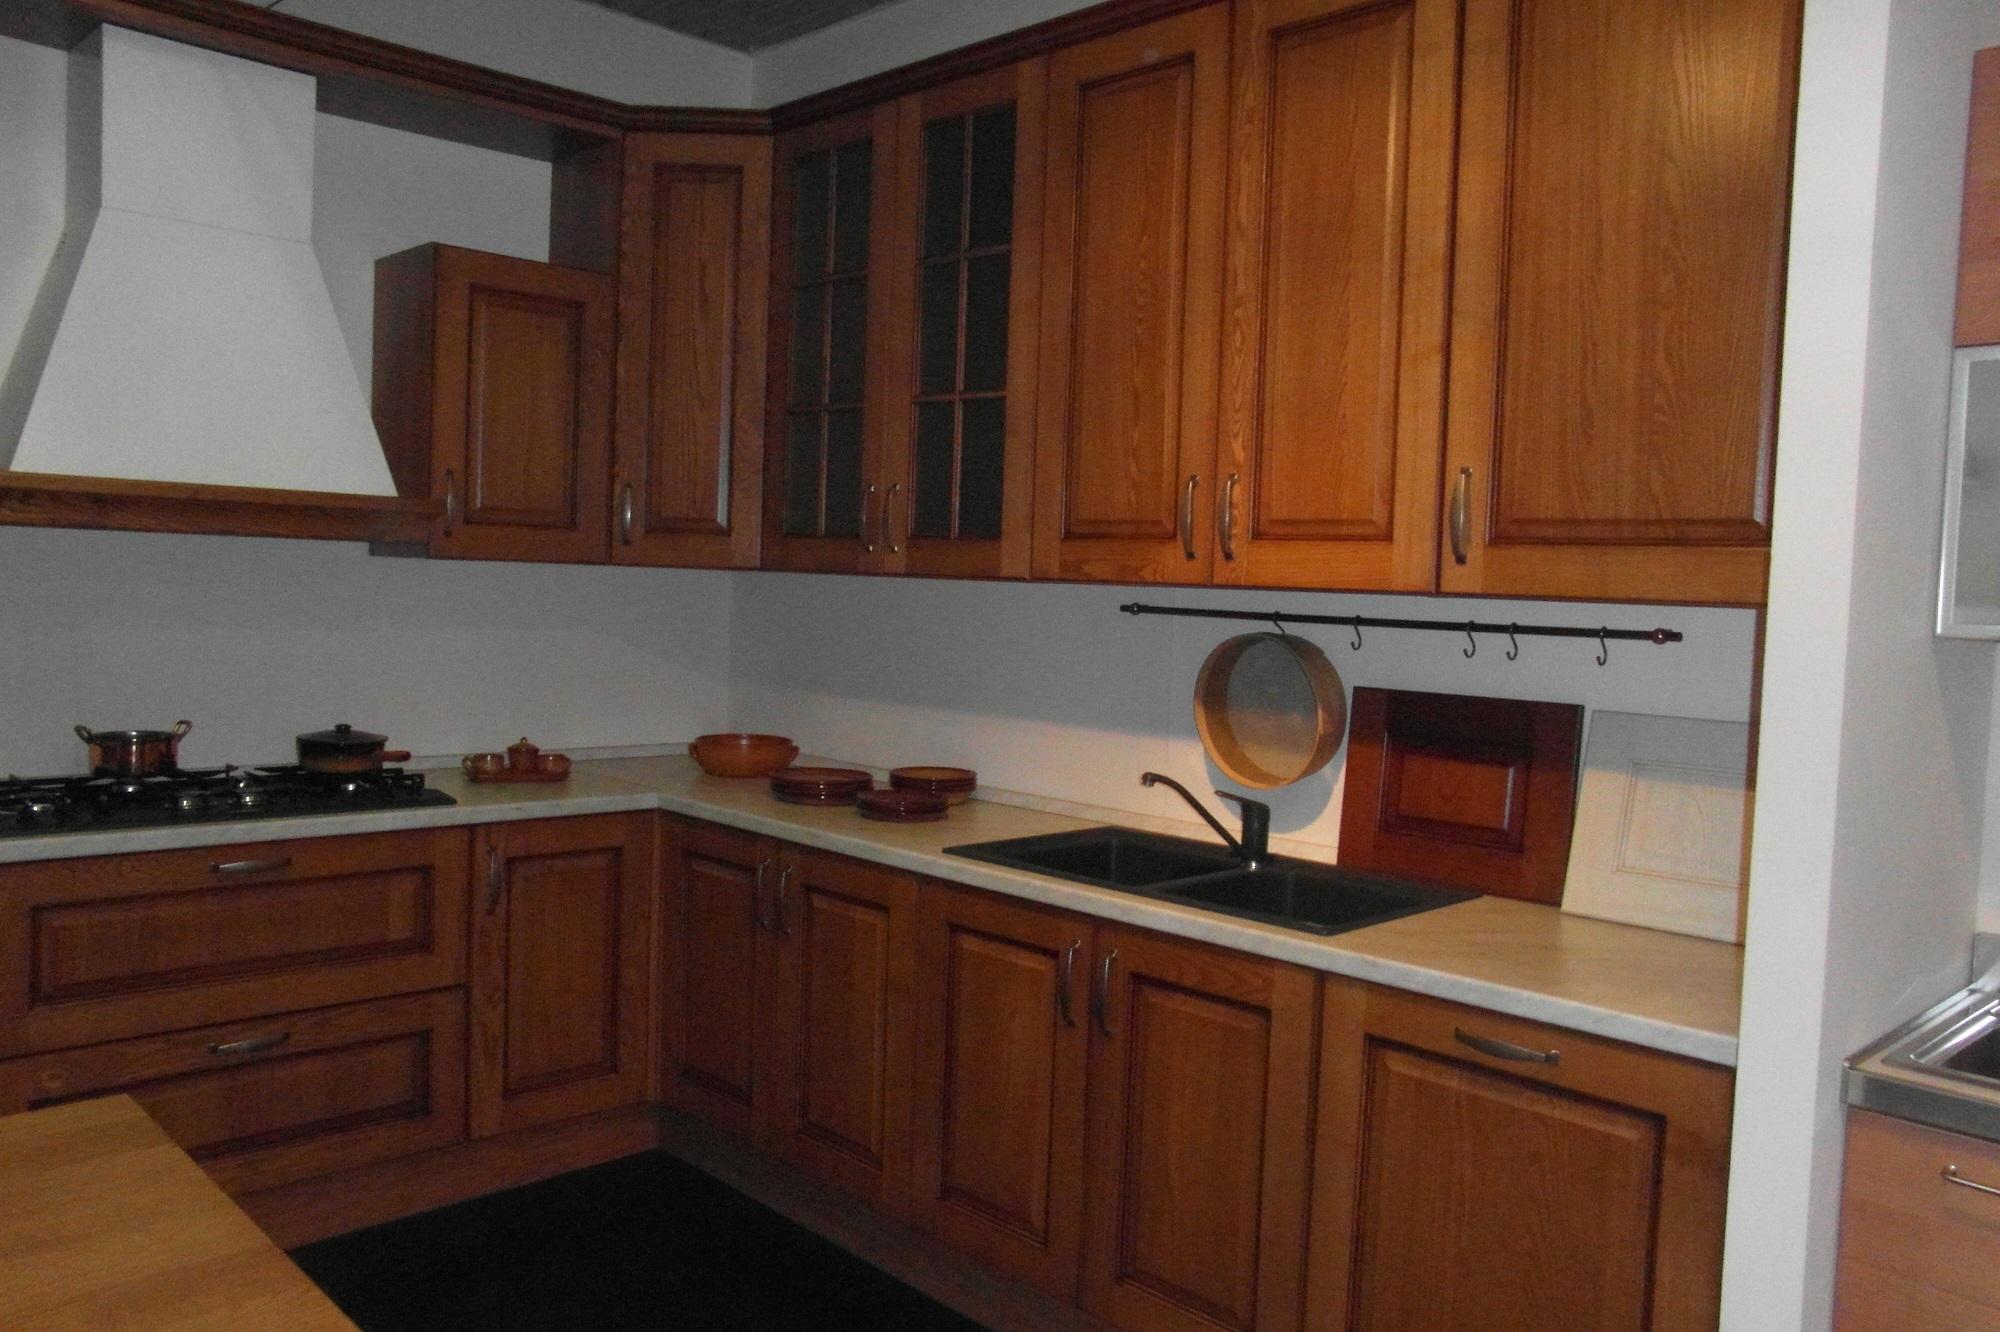 Cucina classica cucinesse in vero noce chiaro cucine a prezzi scontati - Colore parete cucina noce ...